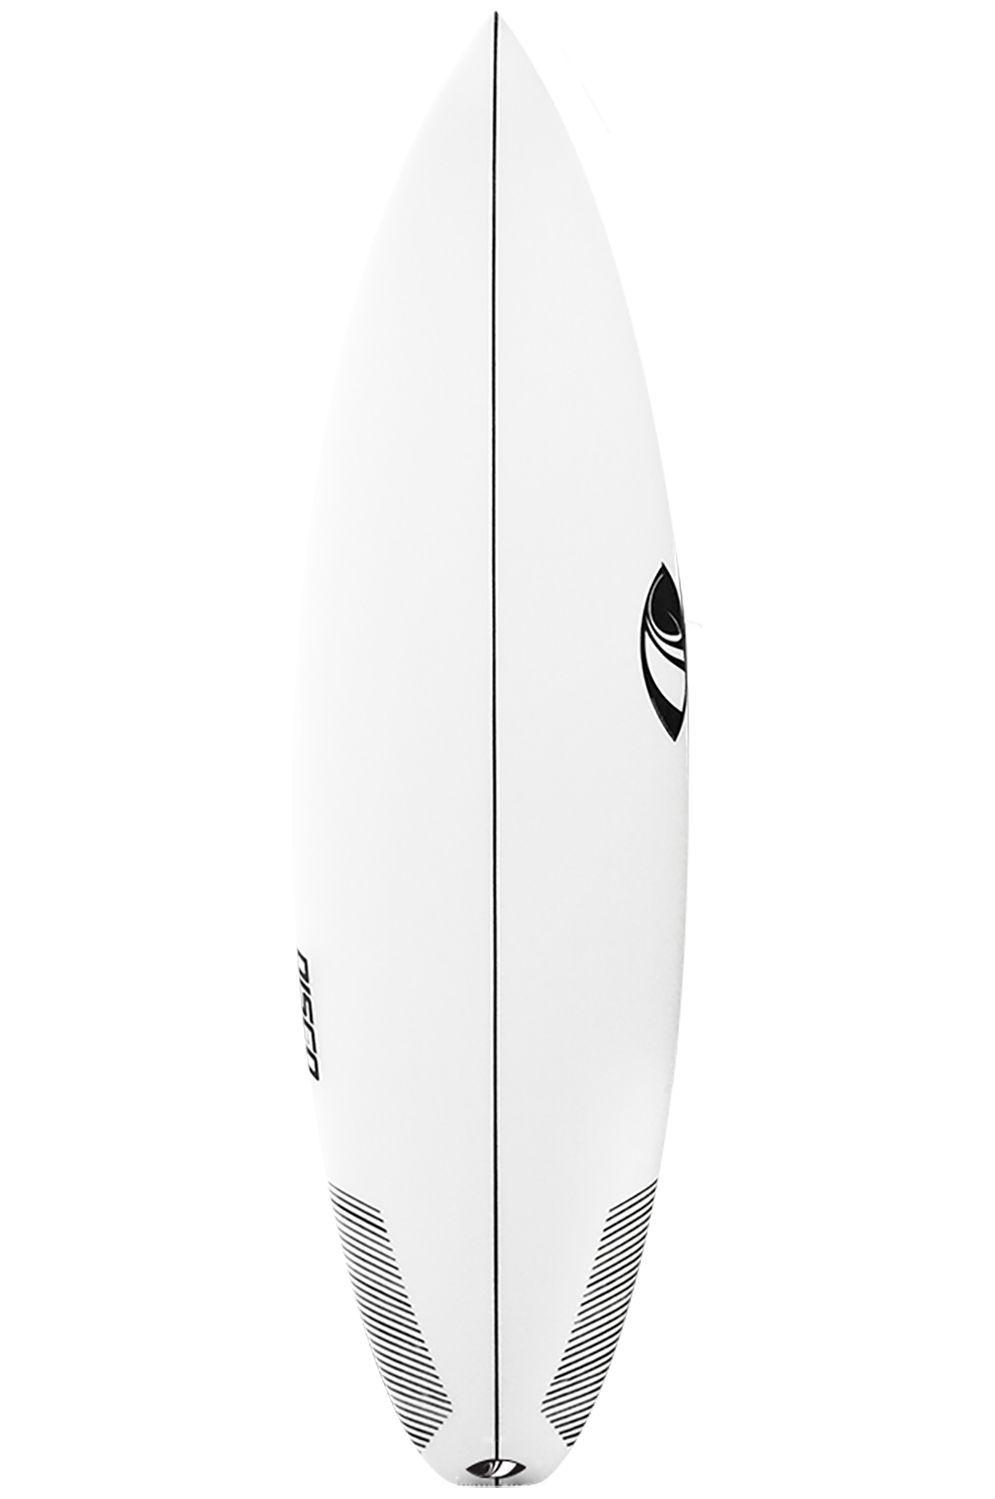 Prancha Surf Sharpeye 5'8 DISCO Squash Tail - White FCS II 5ft8